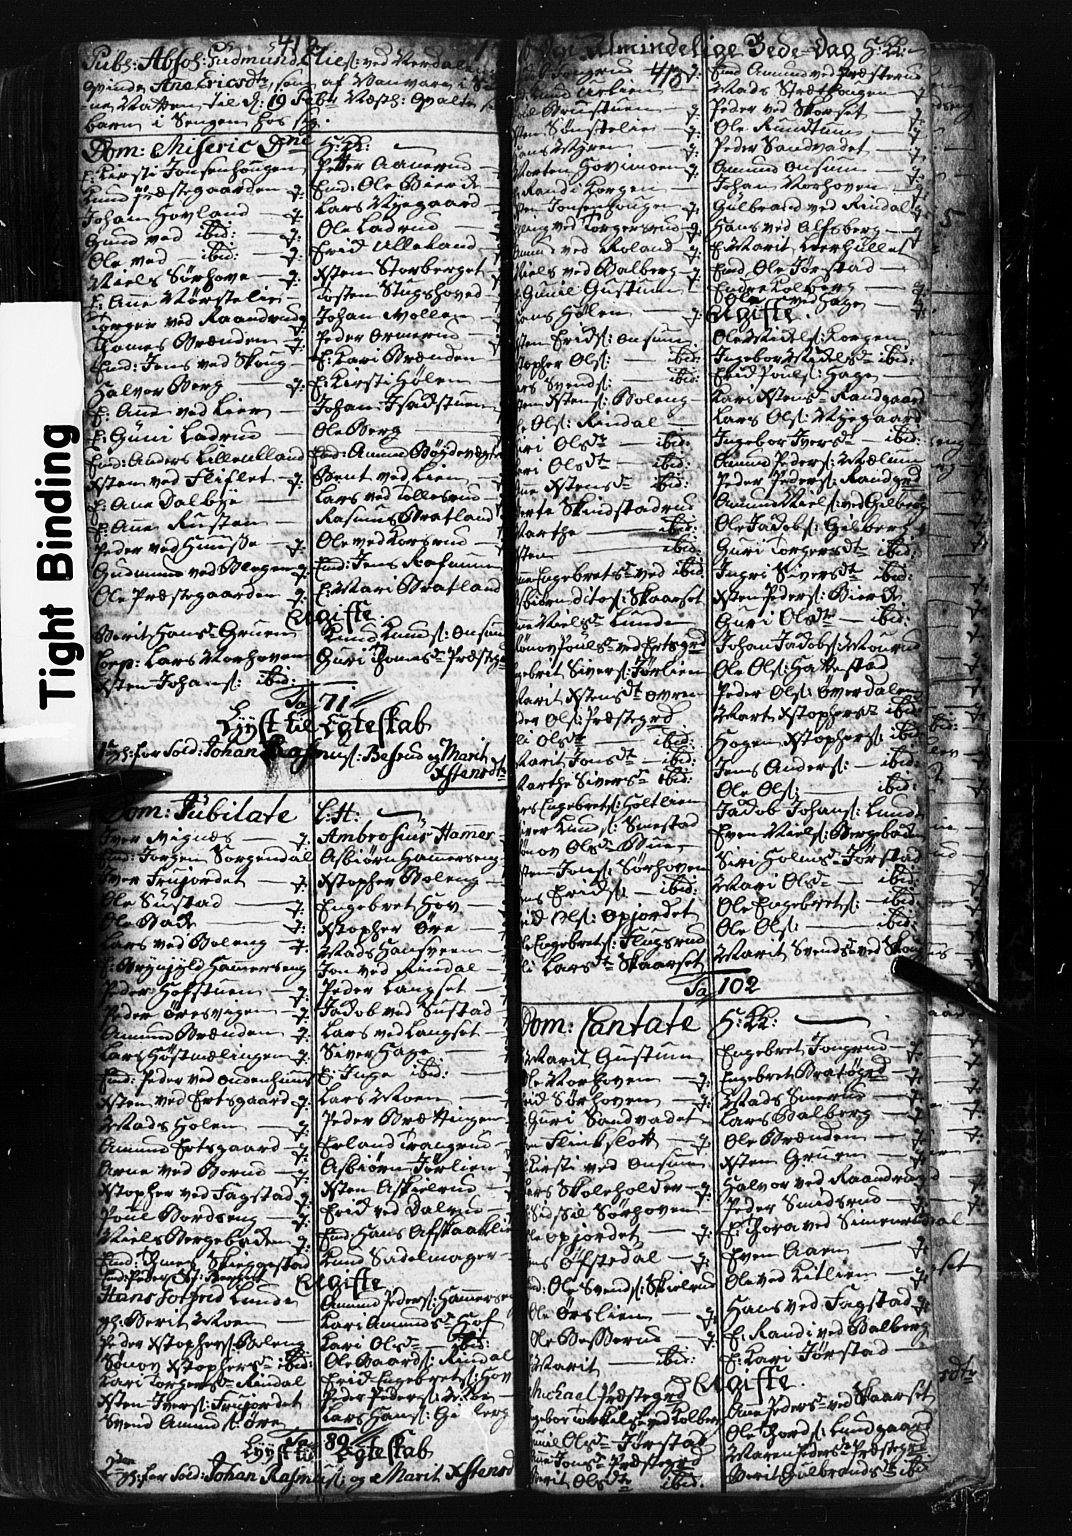 SAH, Fåberg prestekontor, Klokkerbok nr. 1, 1727-1767, s. 412-413